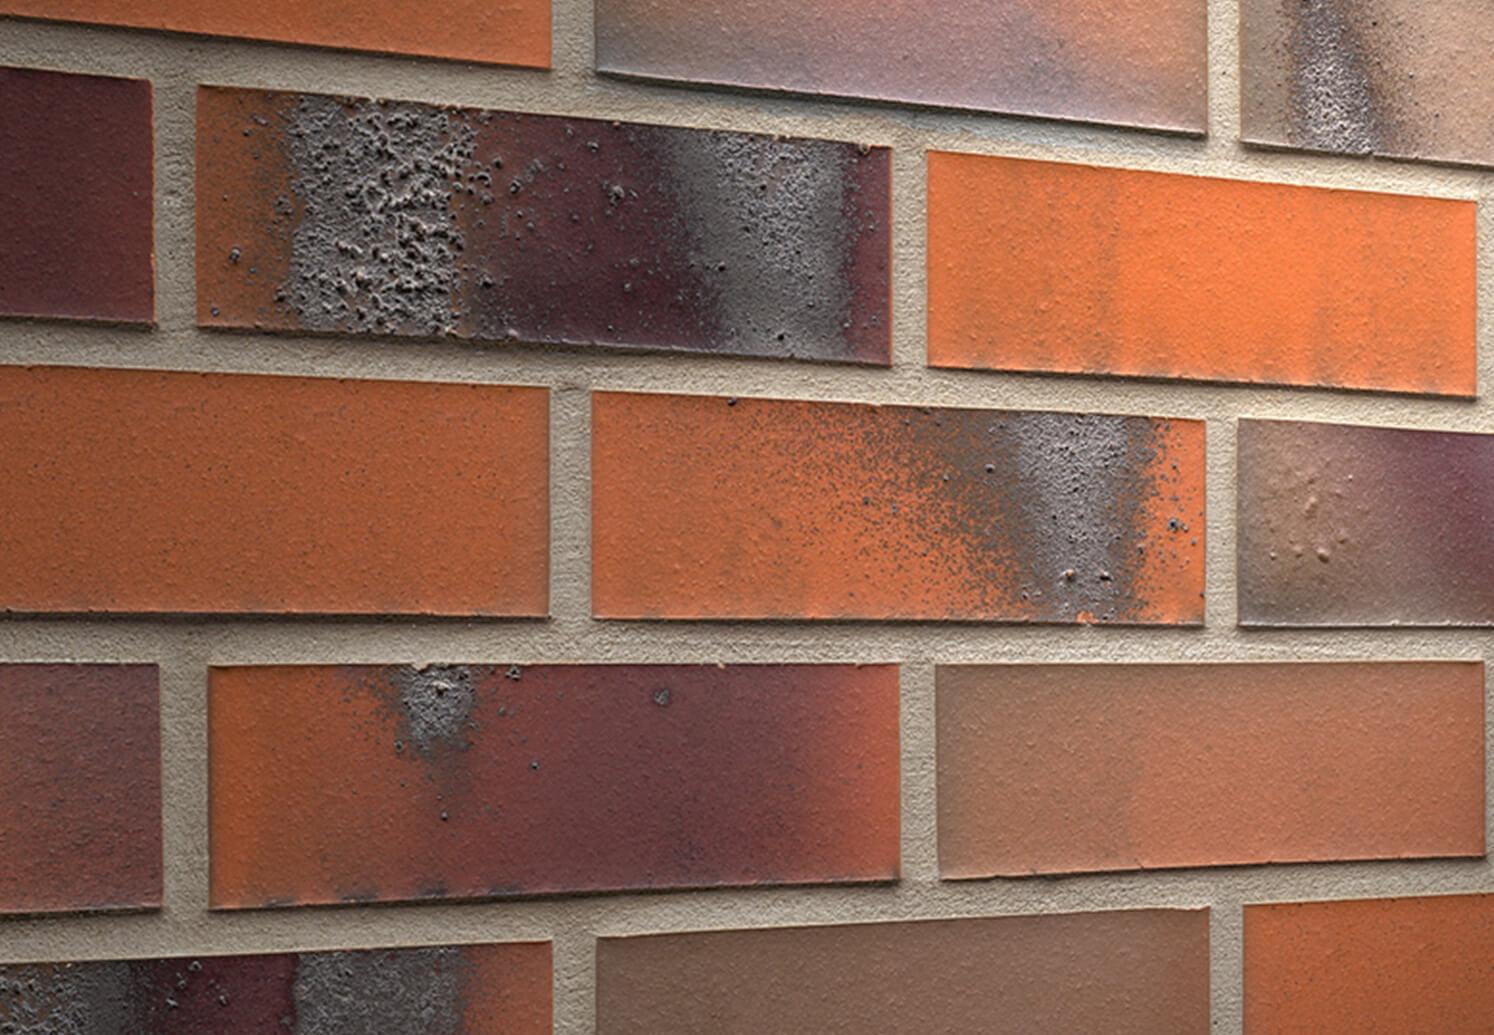 Feldhaus Klinker - R562NF14, Carbona Terreno Bluastro, 240x14x71 - Клинкерная плитка для фасада и внутренней отделки